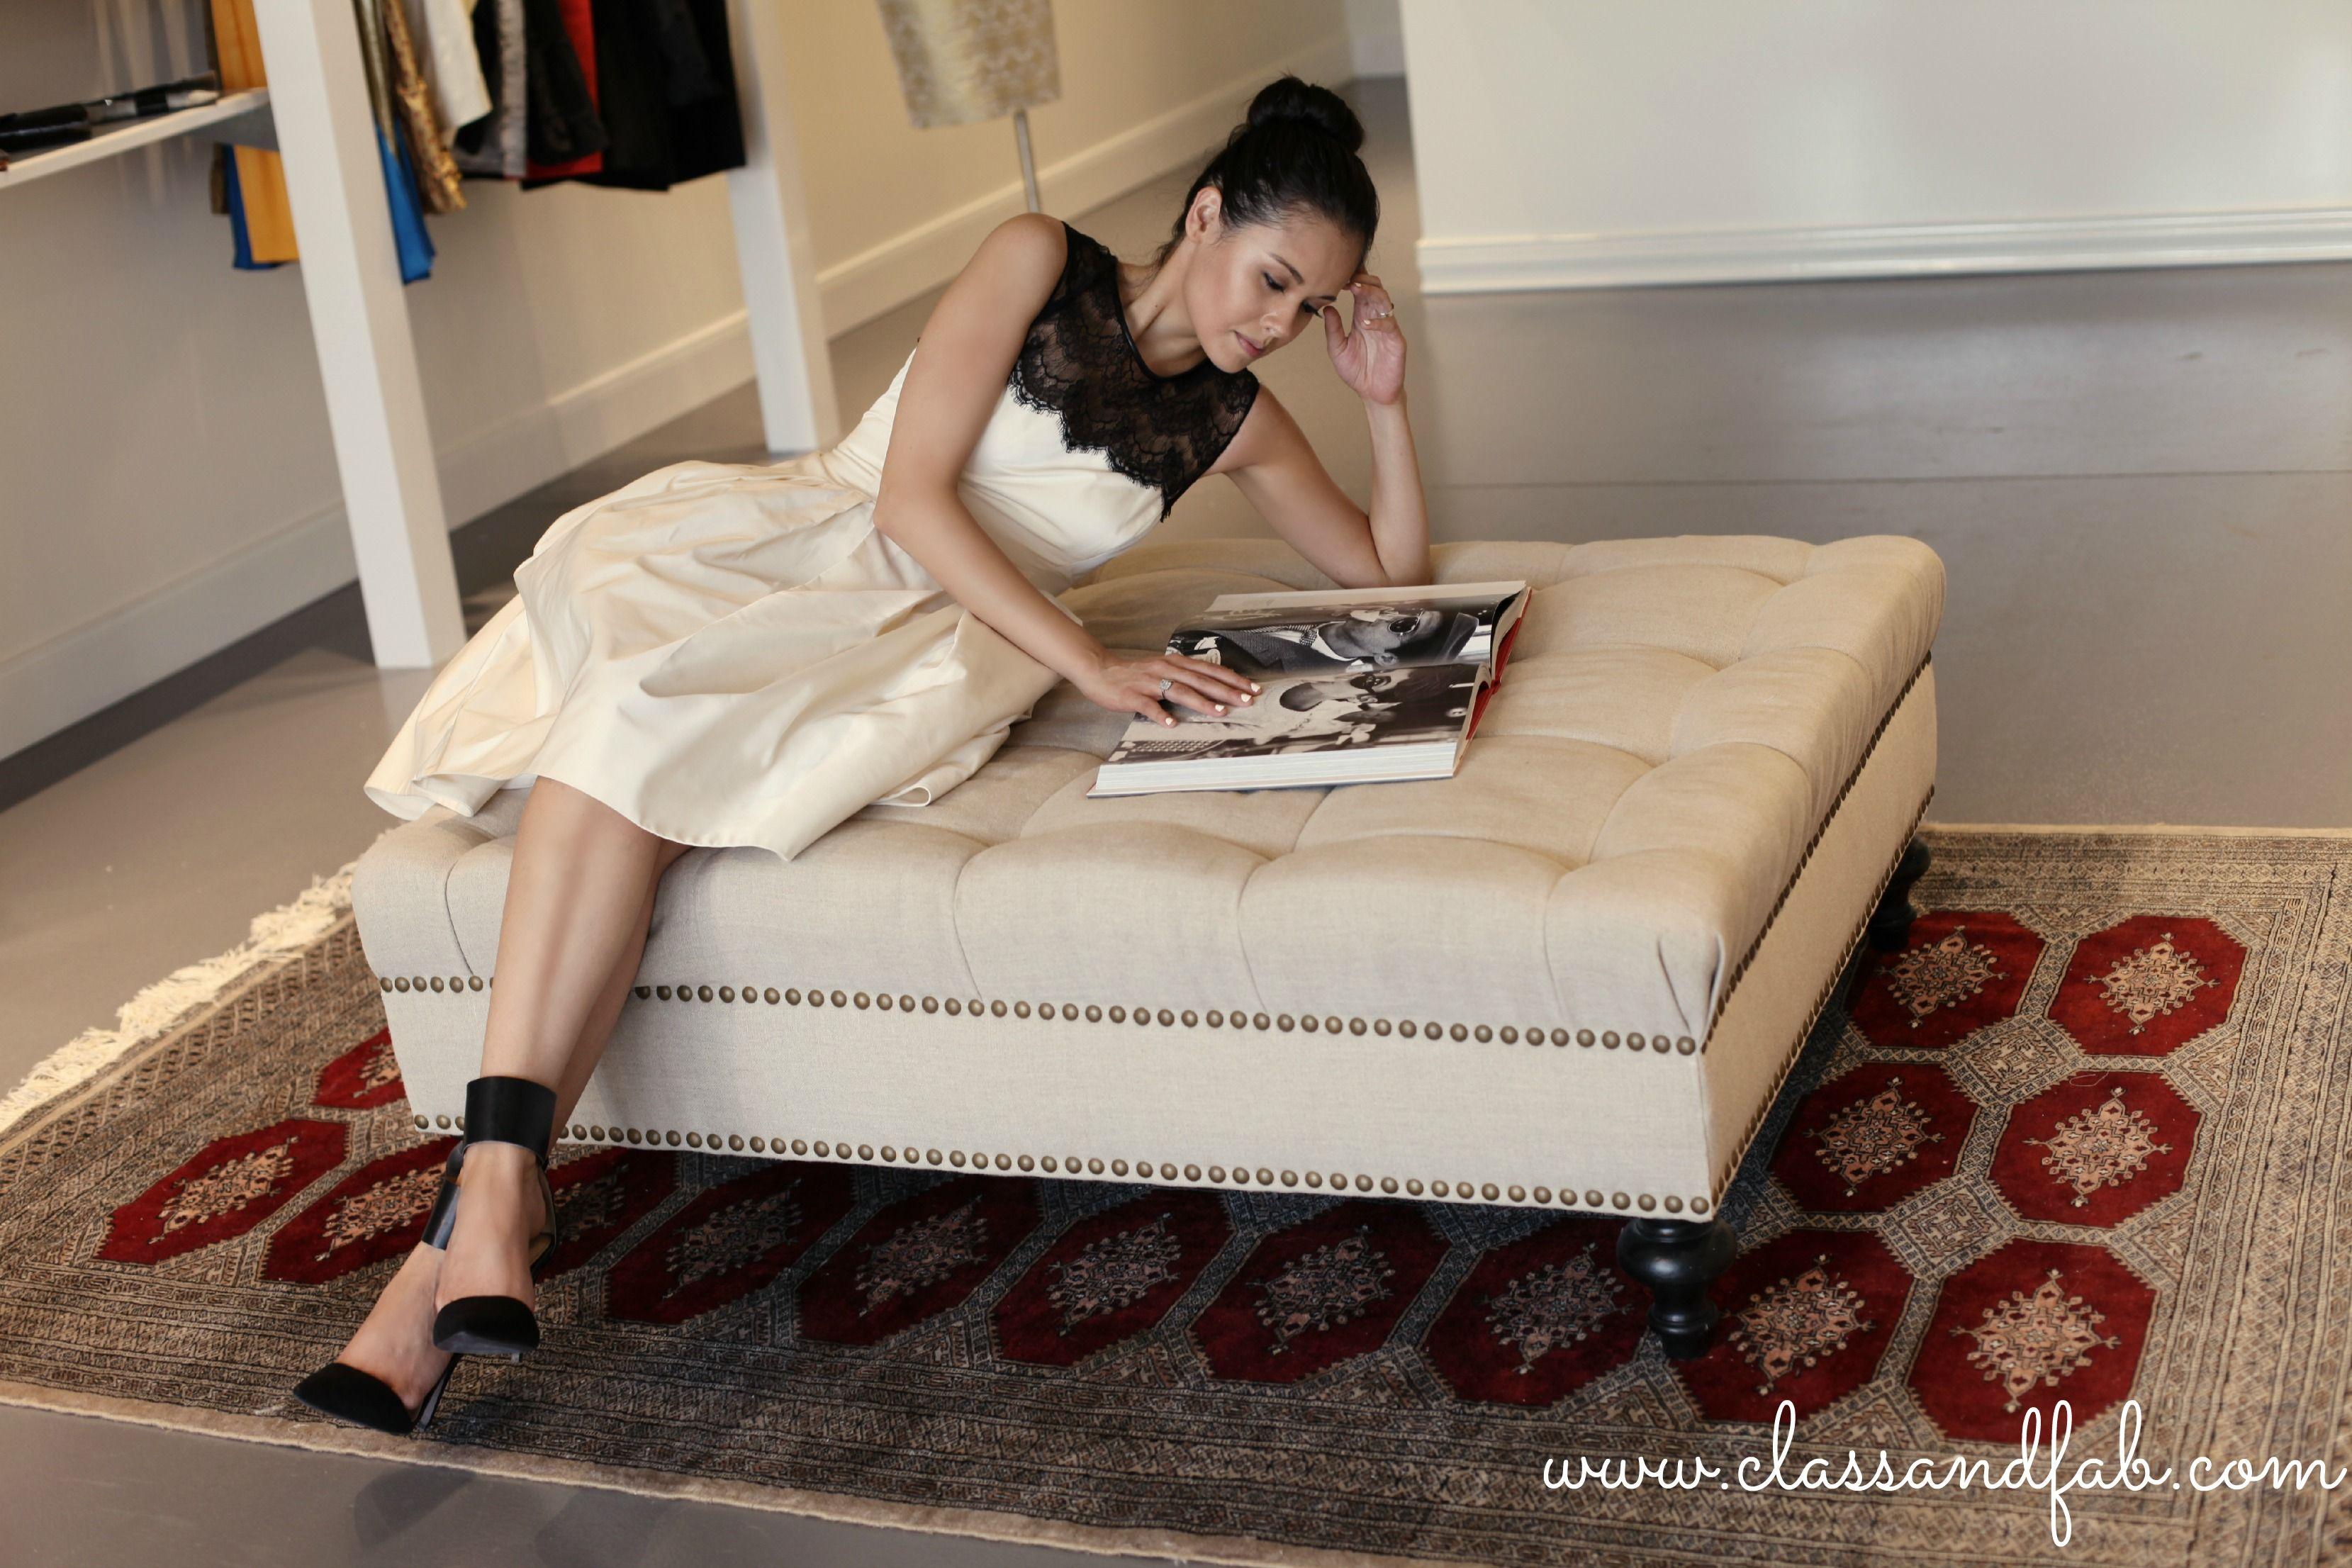 Interview at #BOEMagazine #Classandfab #Classy and Fabulous #MonicaAbney #Fashion #Style #Blogger #USA #Coco #Chanel #Lanvin #VictoriaBeckham #OscardelaRenta #CarolinaHerrera #Chloe #OliviaPalermo #Hermes #AudreyHepburn